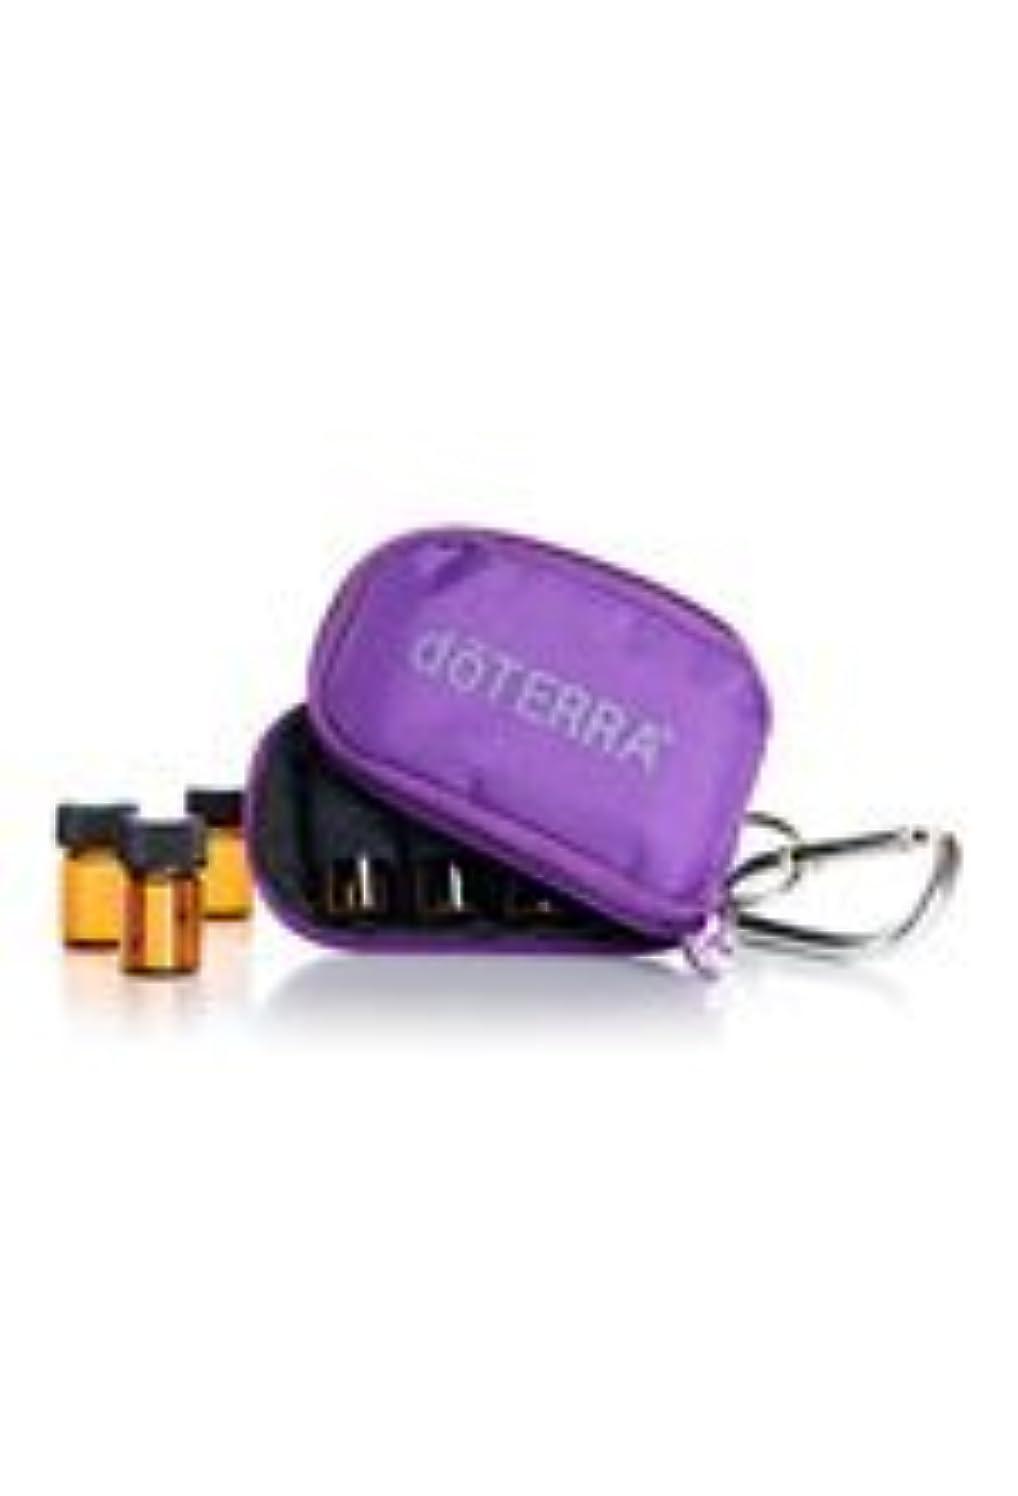 doTERRAドテラ ミニ ボトル ケース パープル ミニボトル 2ml 8本 精油 エッセンシャルオイル 携帯ケース ポーチ